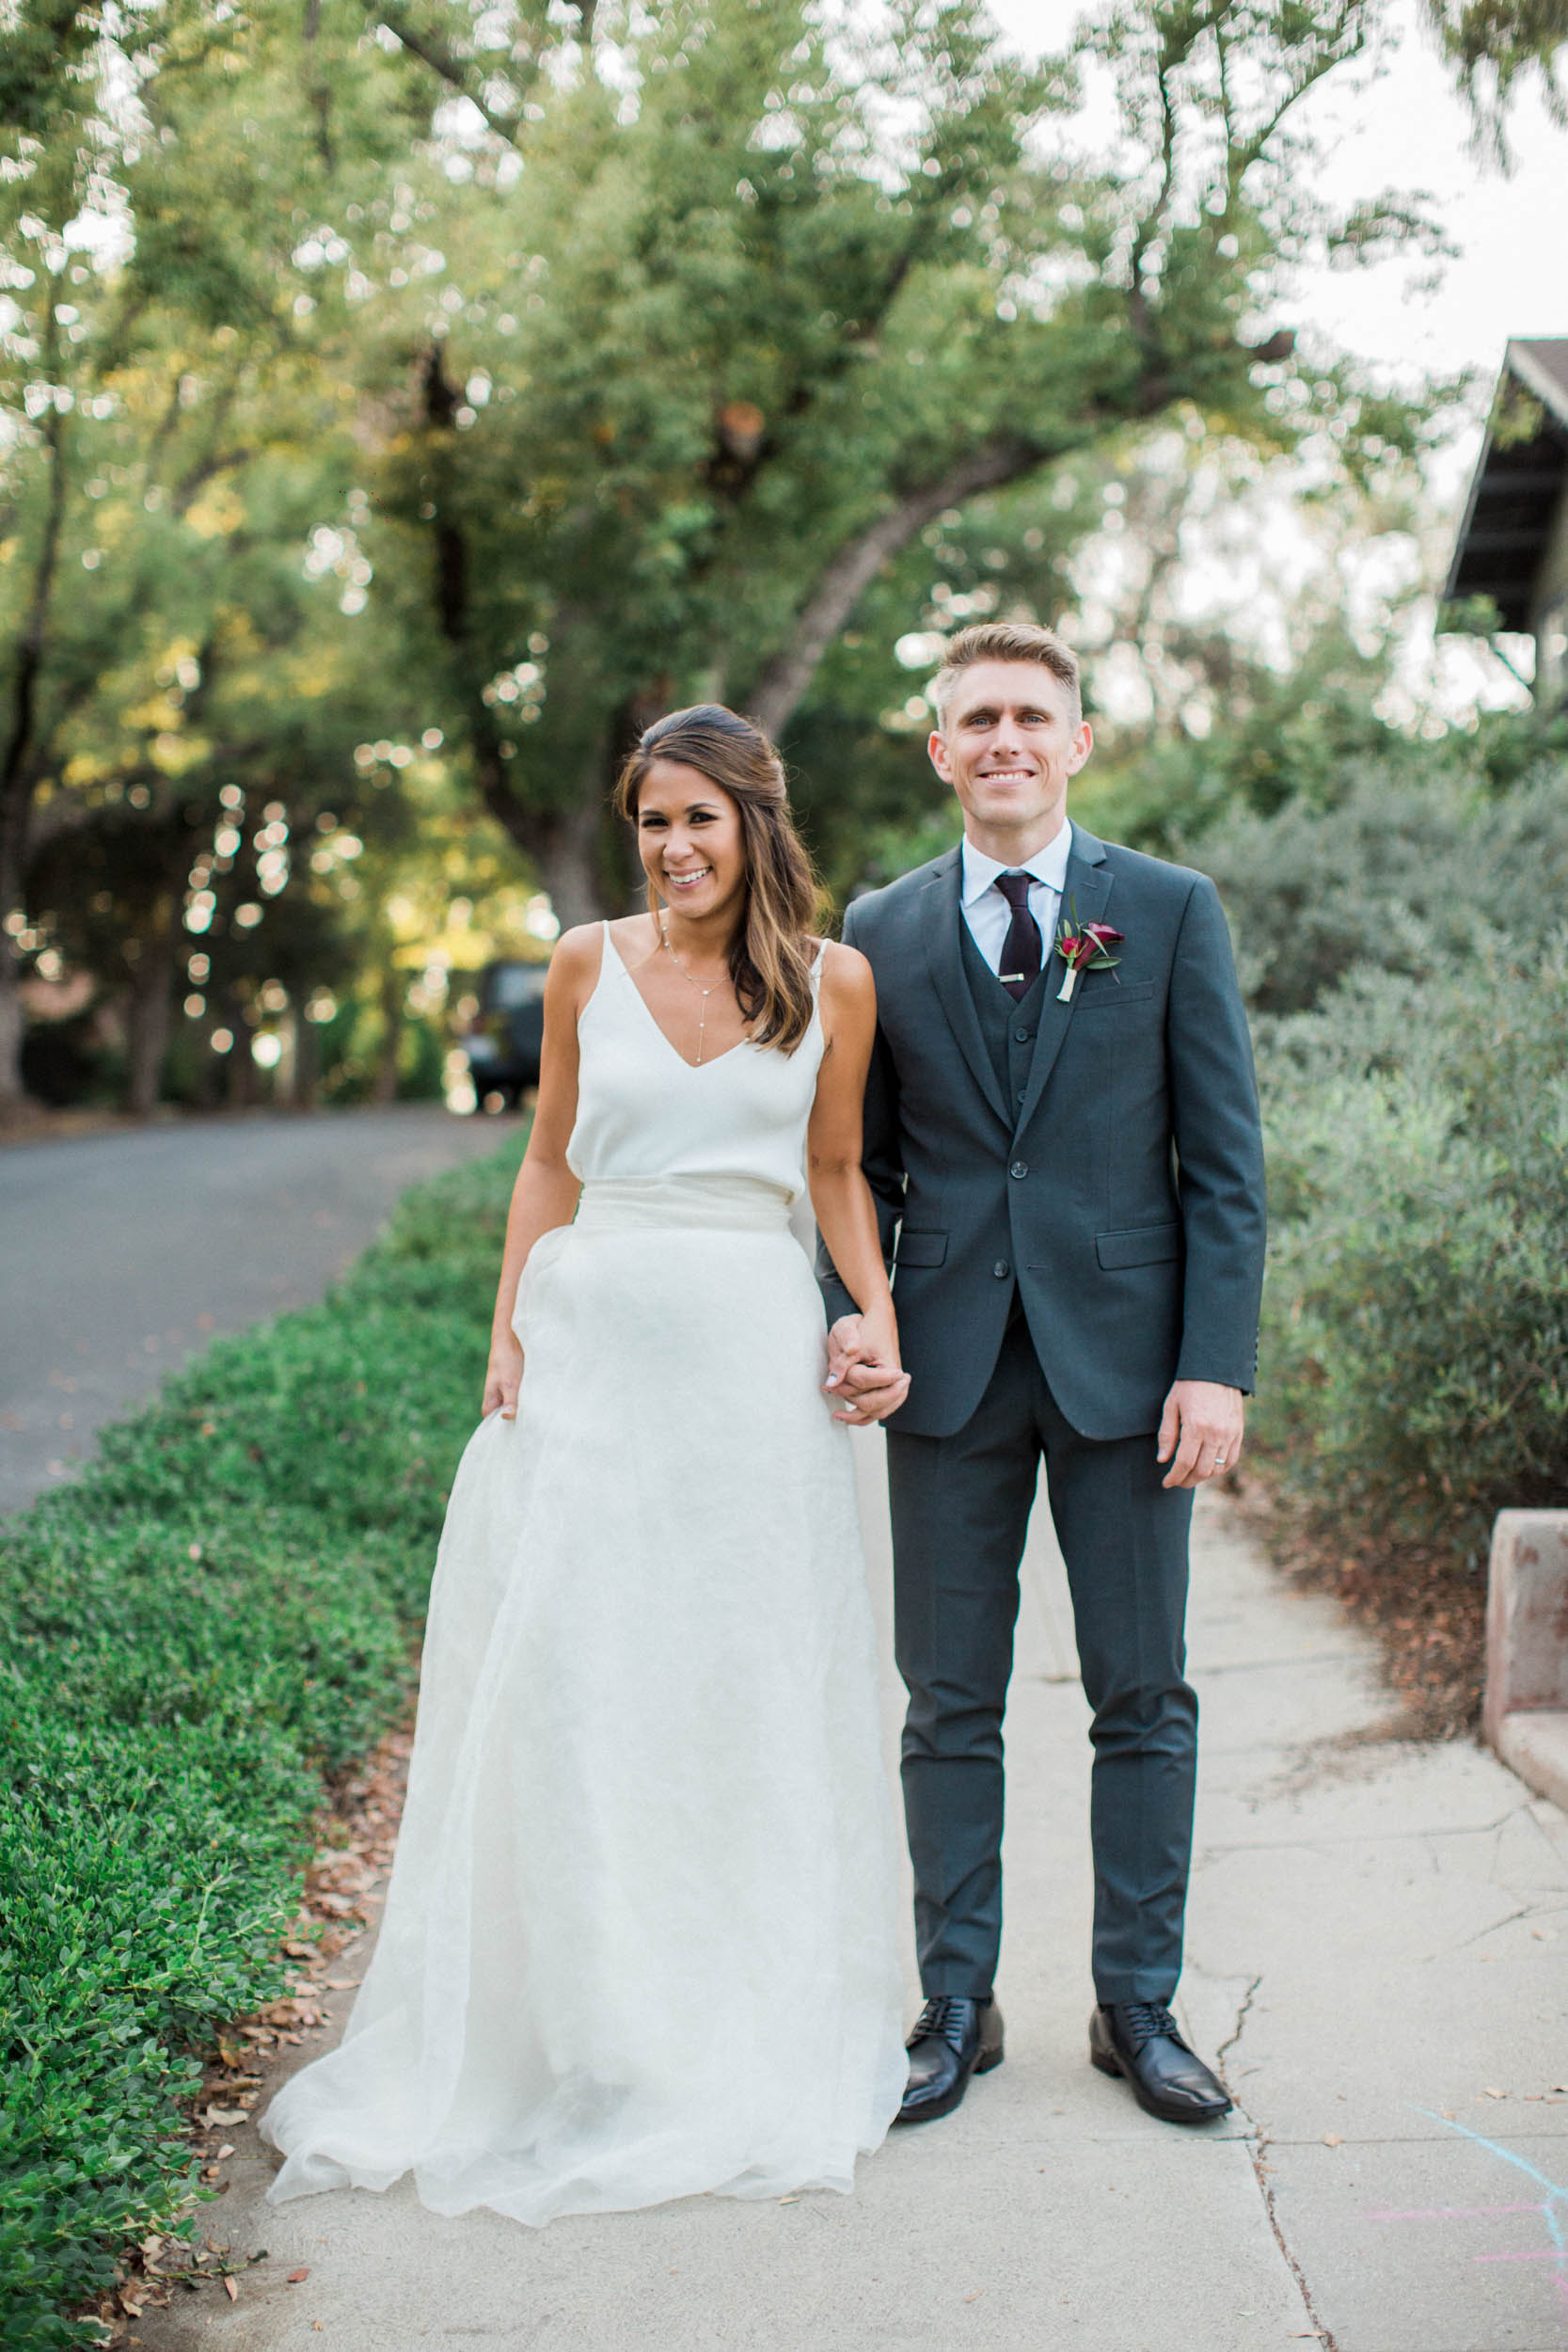 BKM-Photography-Highland-Park-Los-Angeles-Backyard-Wedding-0049.jpg